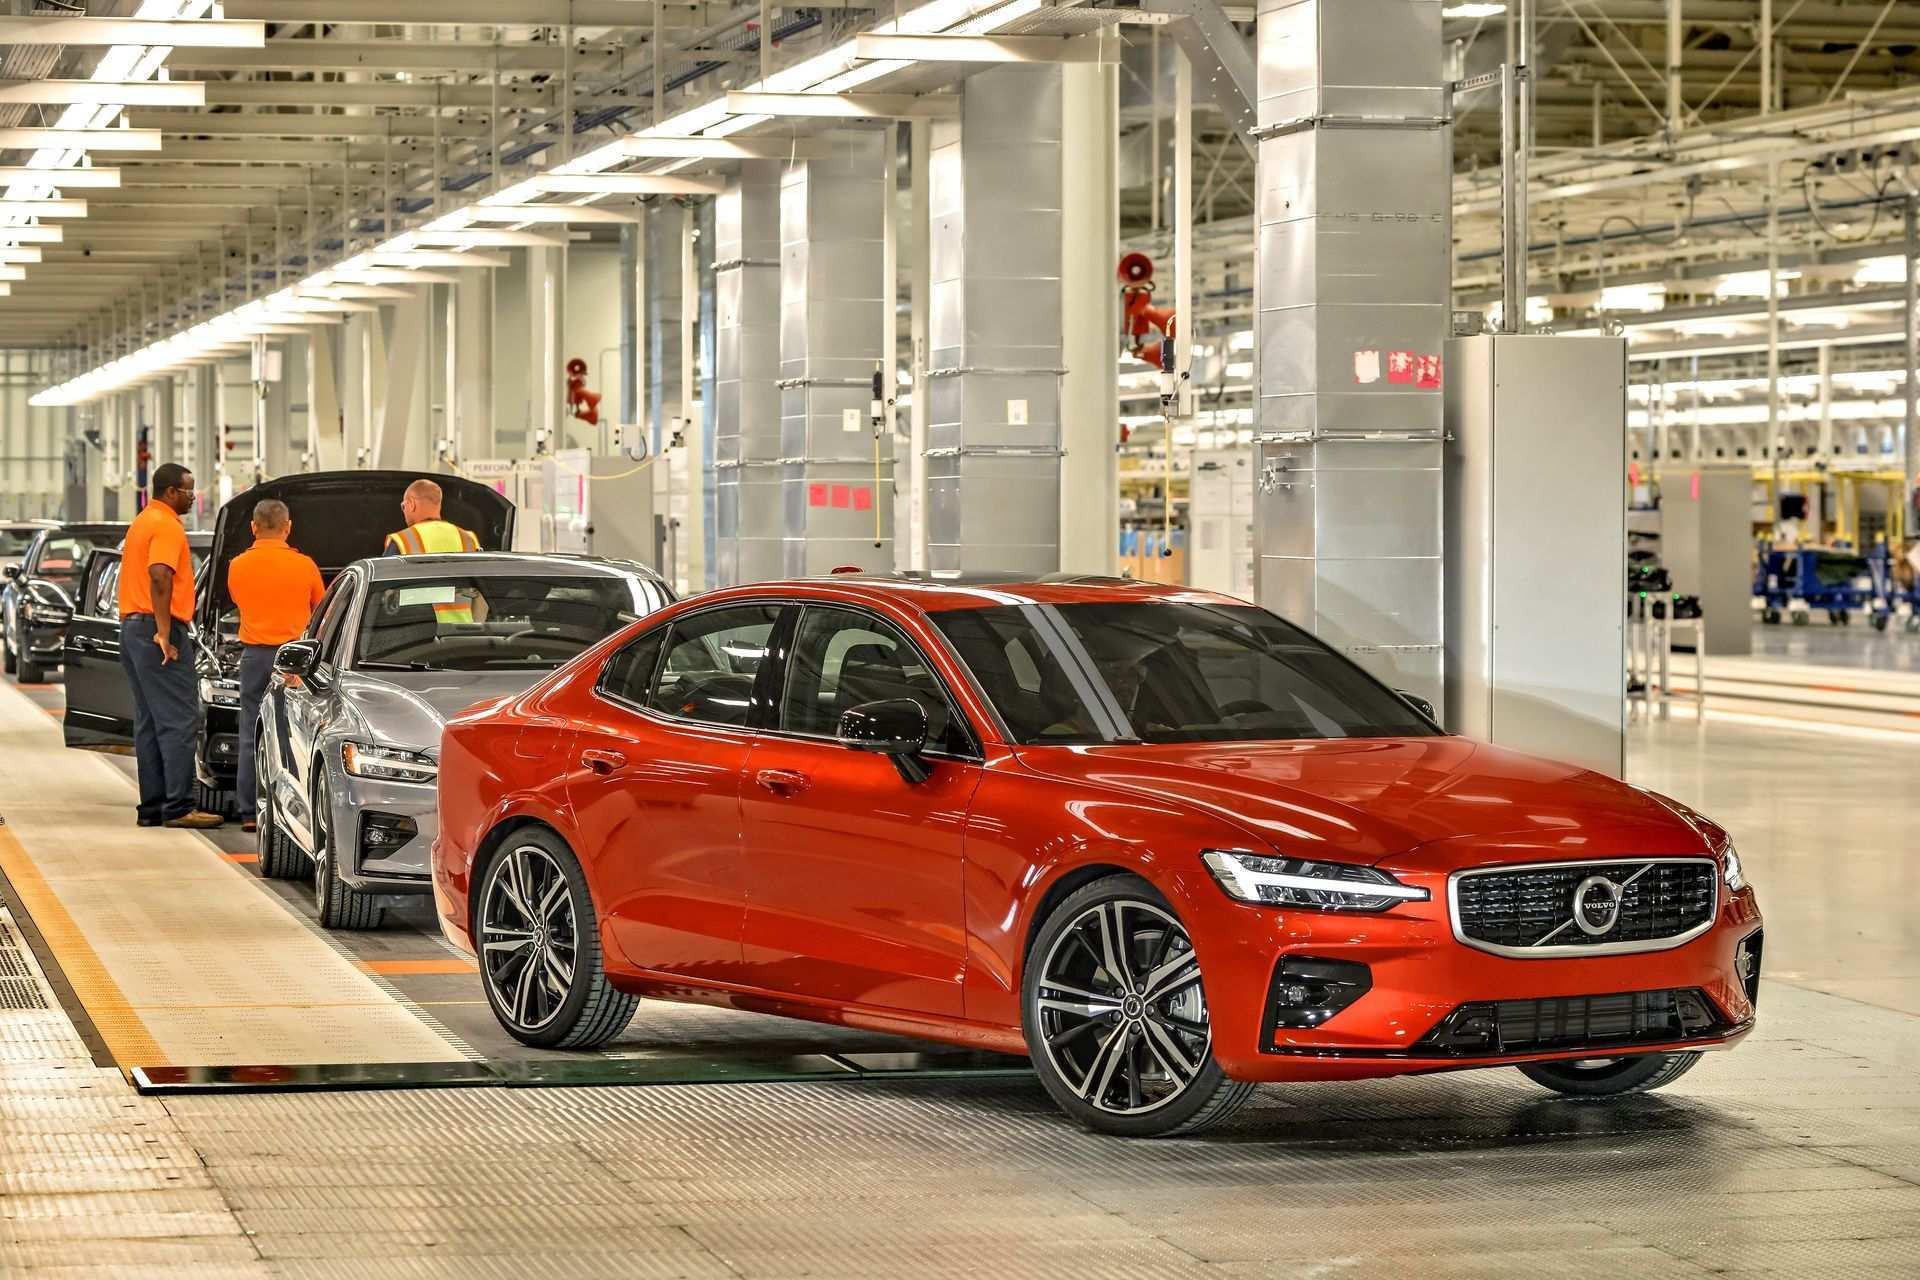 42 All New 2019 Volvo Plug In Hybrid Style for 2019 Volvo Plug In Hybrid